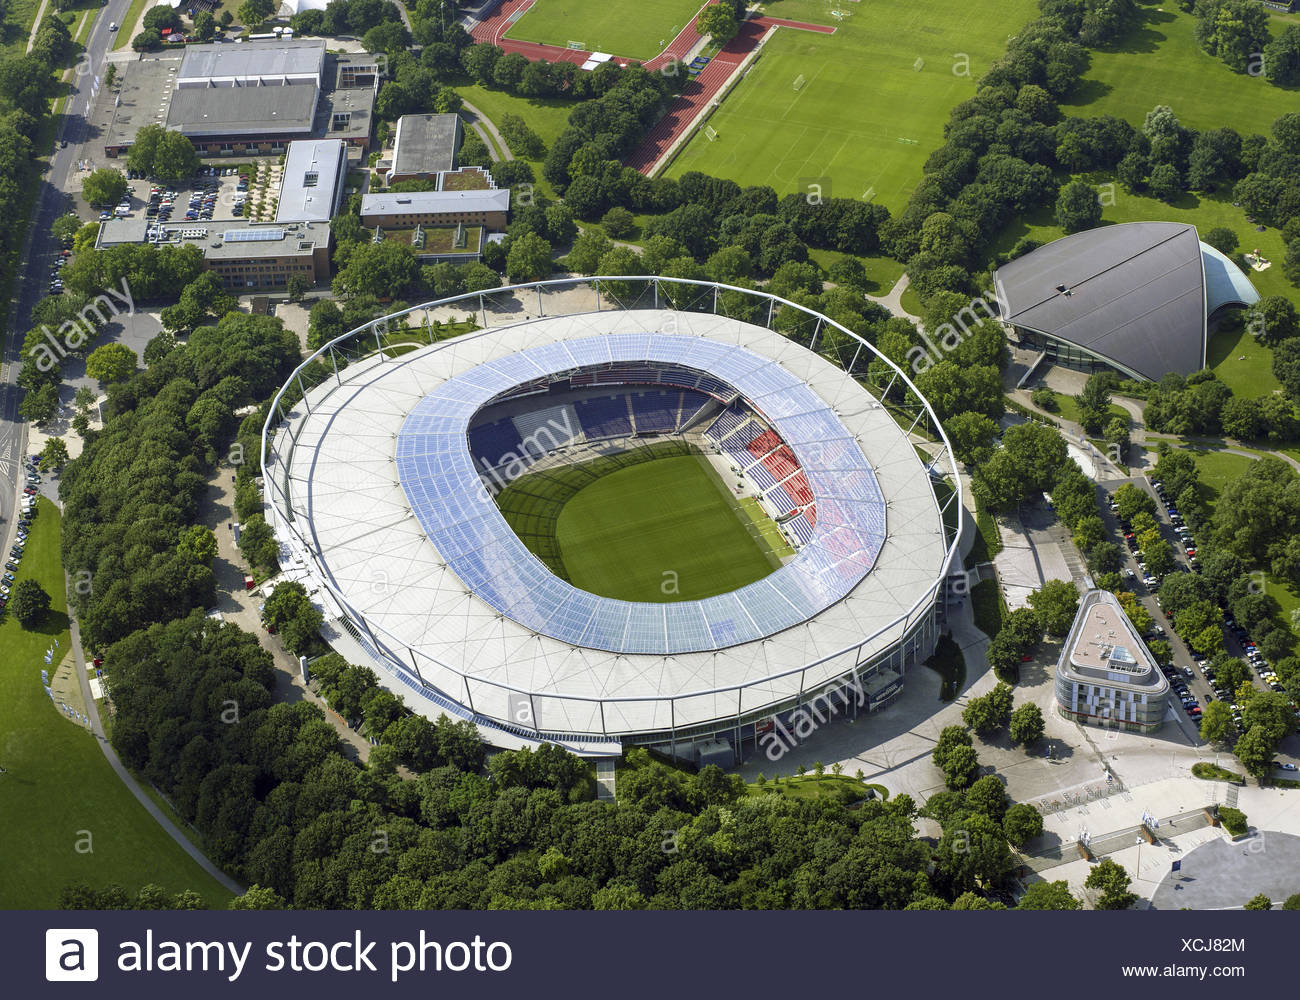 Fussballstadion, AWD-Arena, Hannover, Luftaufnahme - Stock Image